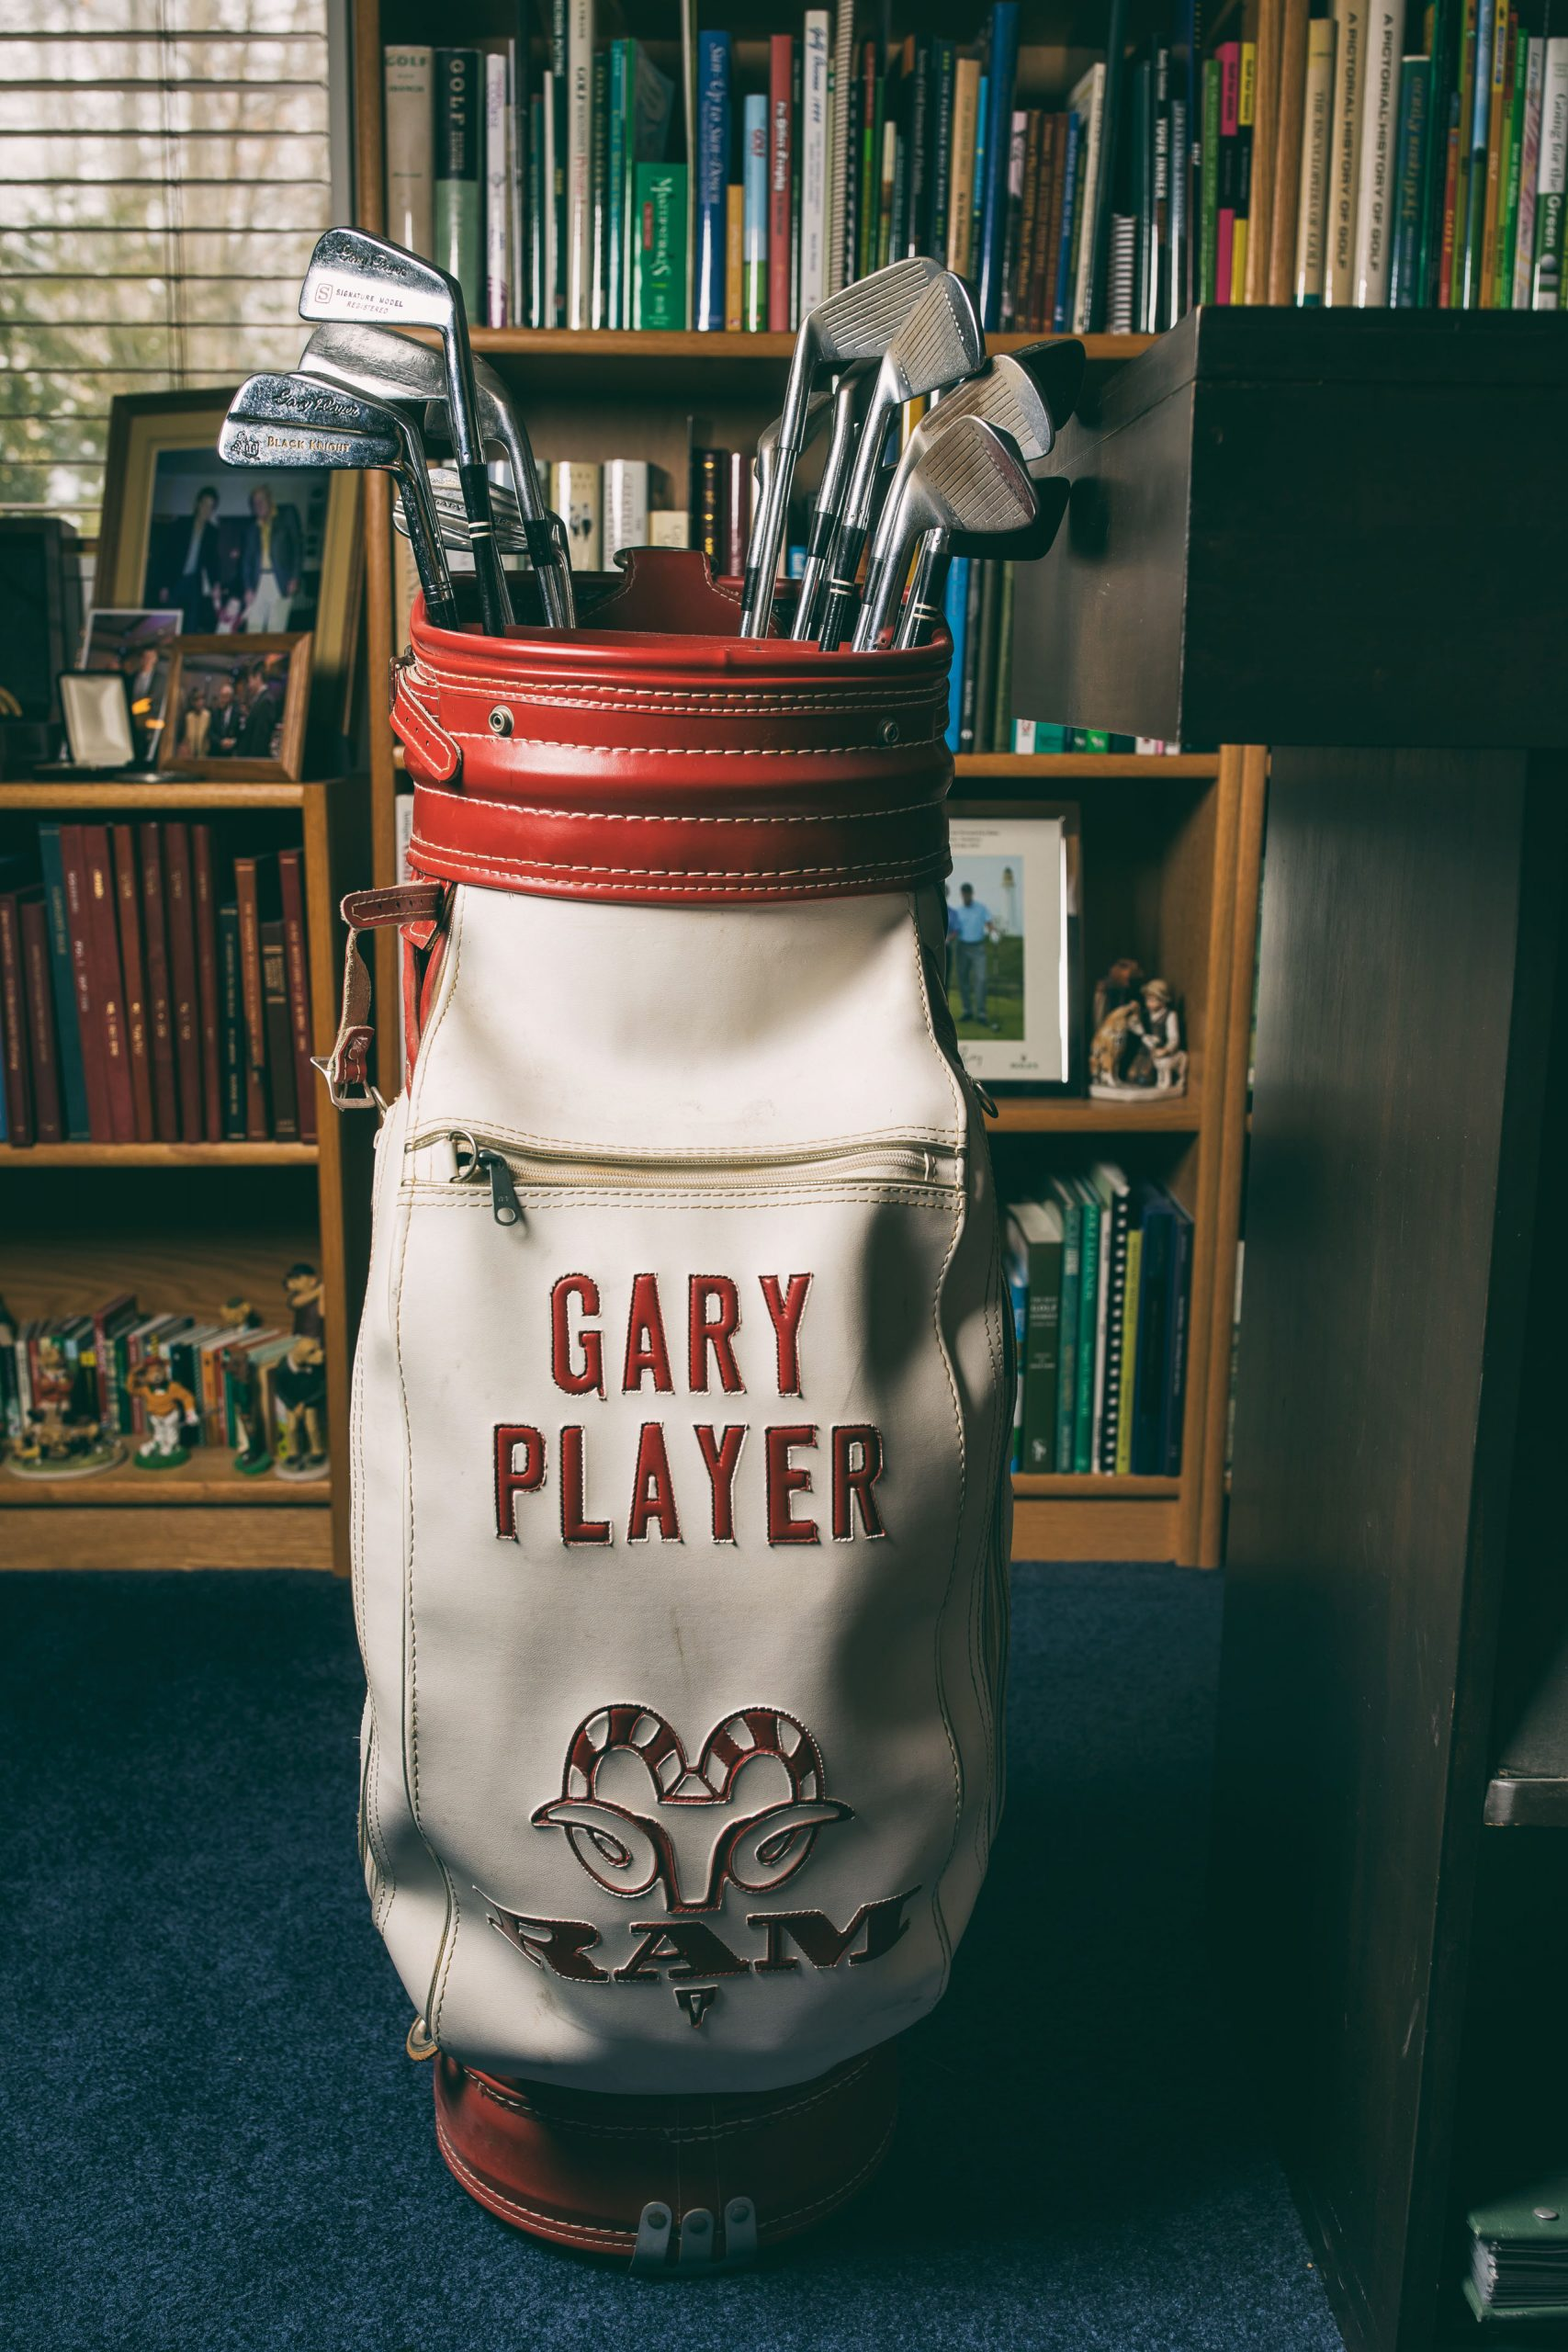 Gary Player's Staff Bag. Photo by Todd Rosenberg .